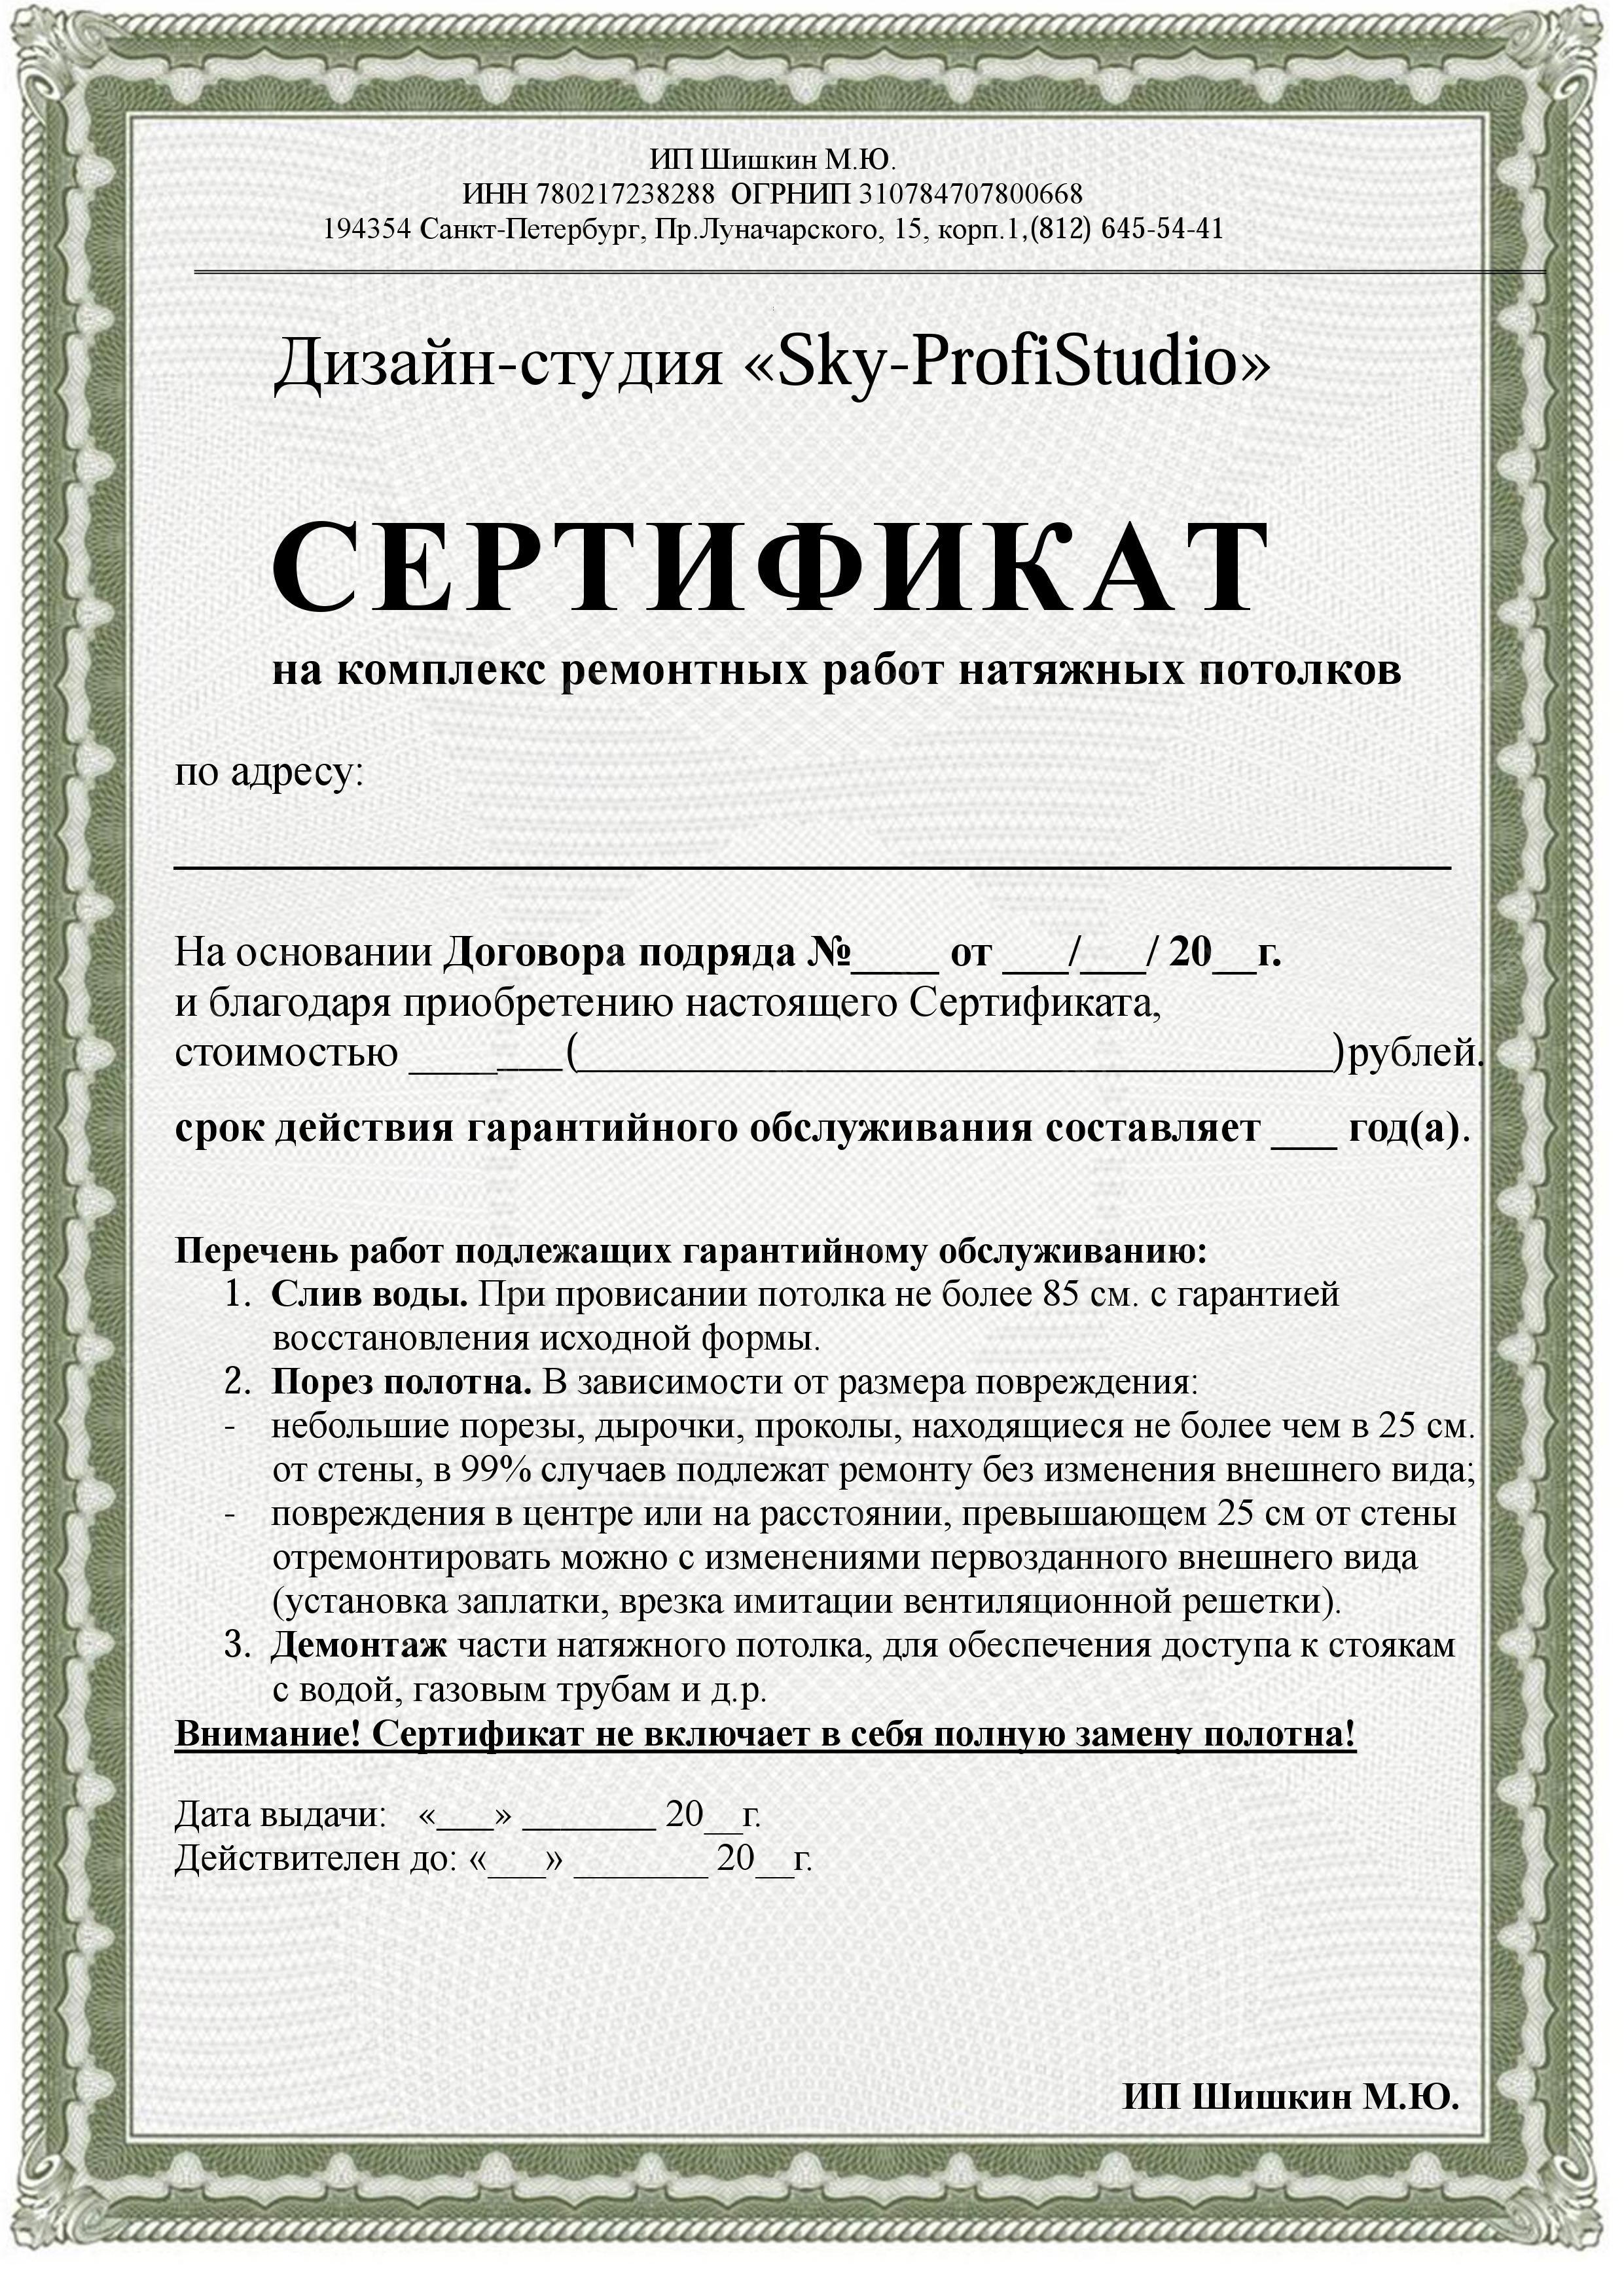 Сертификат на бесплатное обслуживание потолка